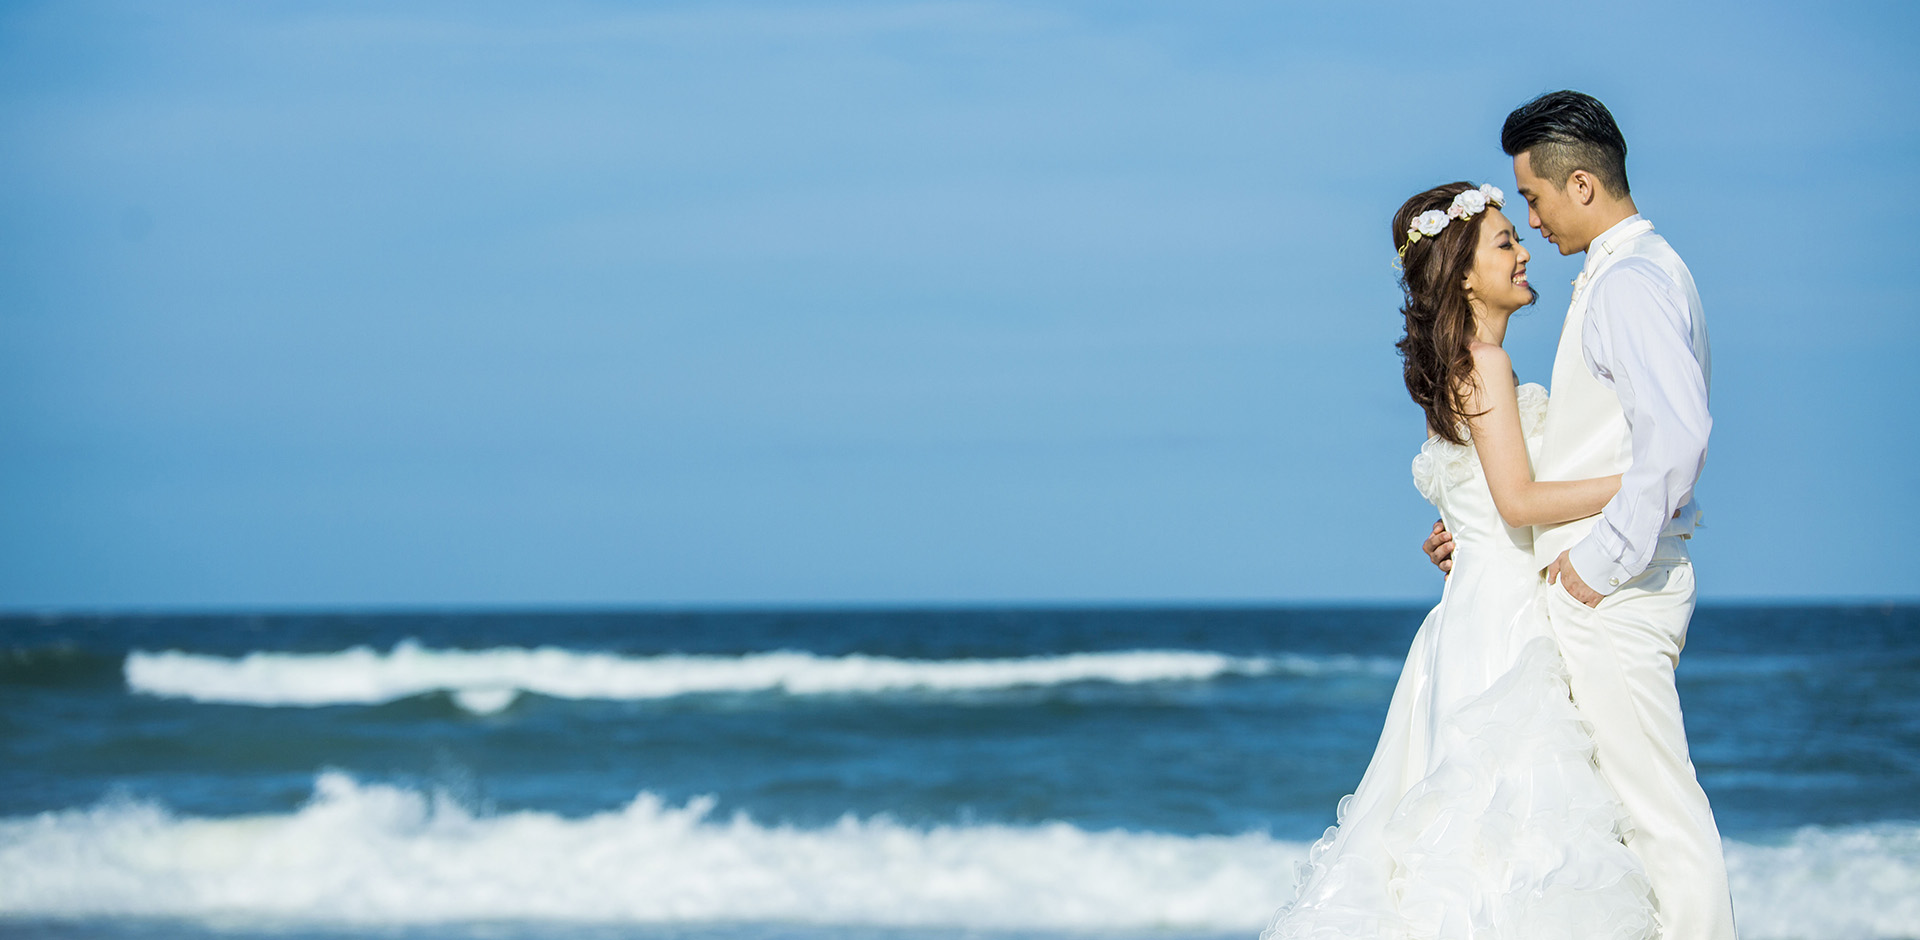 Australian Wedding Gifts For Overseas: Watabe Wedding 華德培婚禮有限公司(台灣分公司